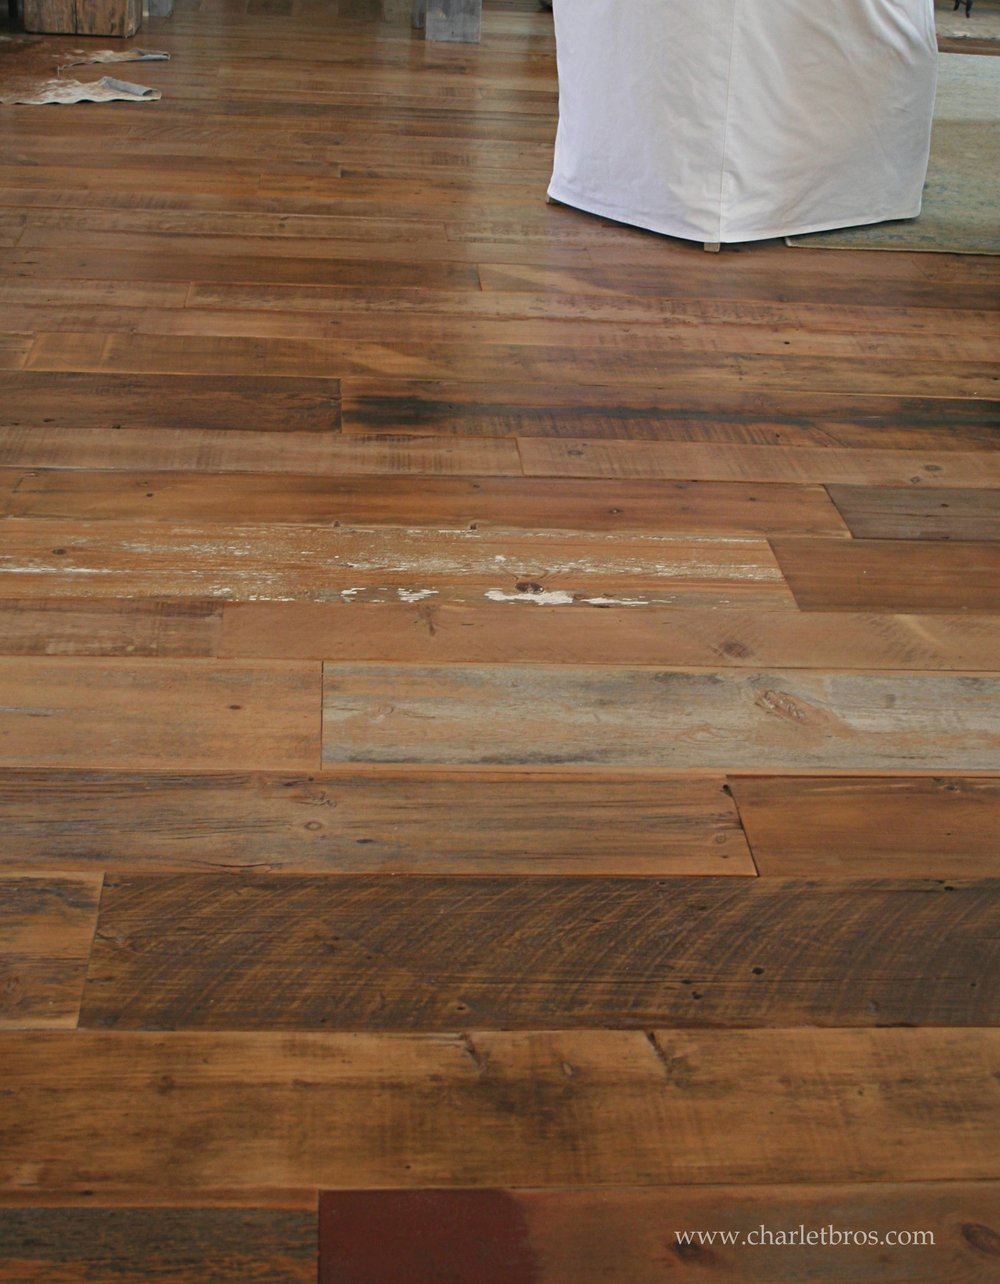 Clairemont antique wood floor T.jpg